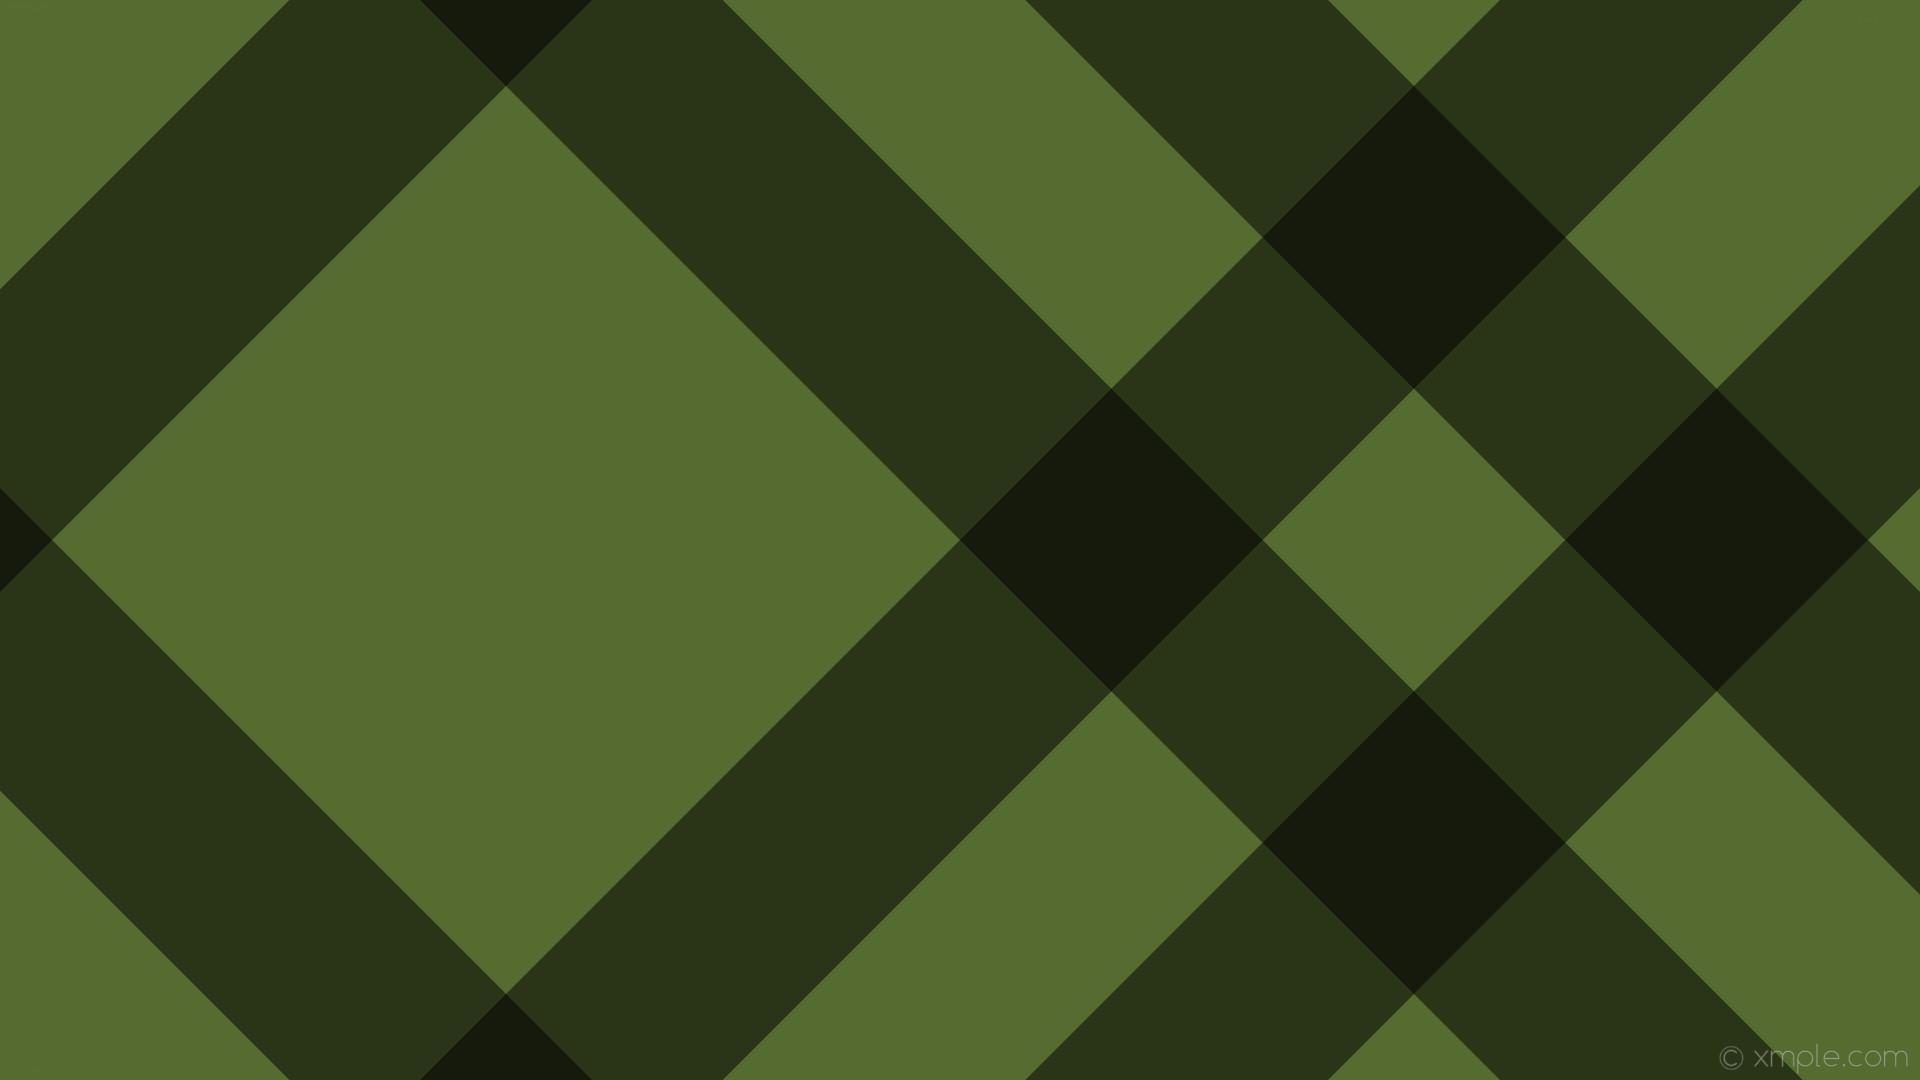 Res: 1920x1080, wallpaper black dual gingham striped green dark olive green #556b2f #000000  45° 214px